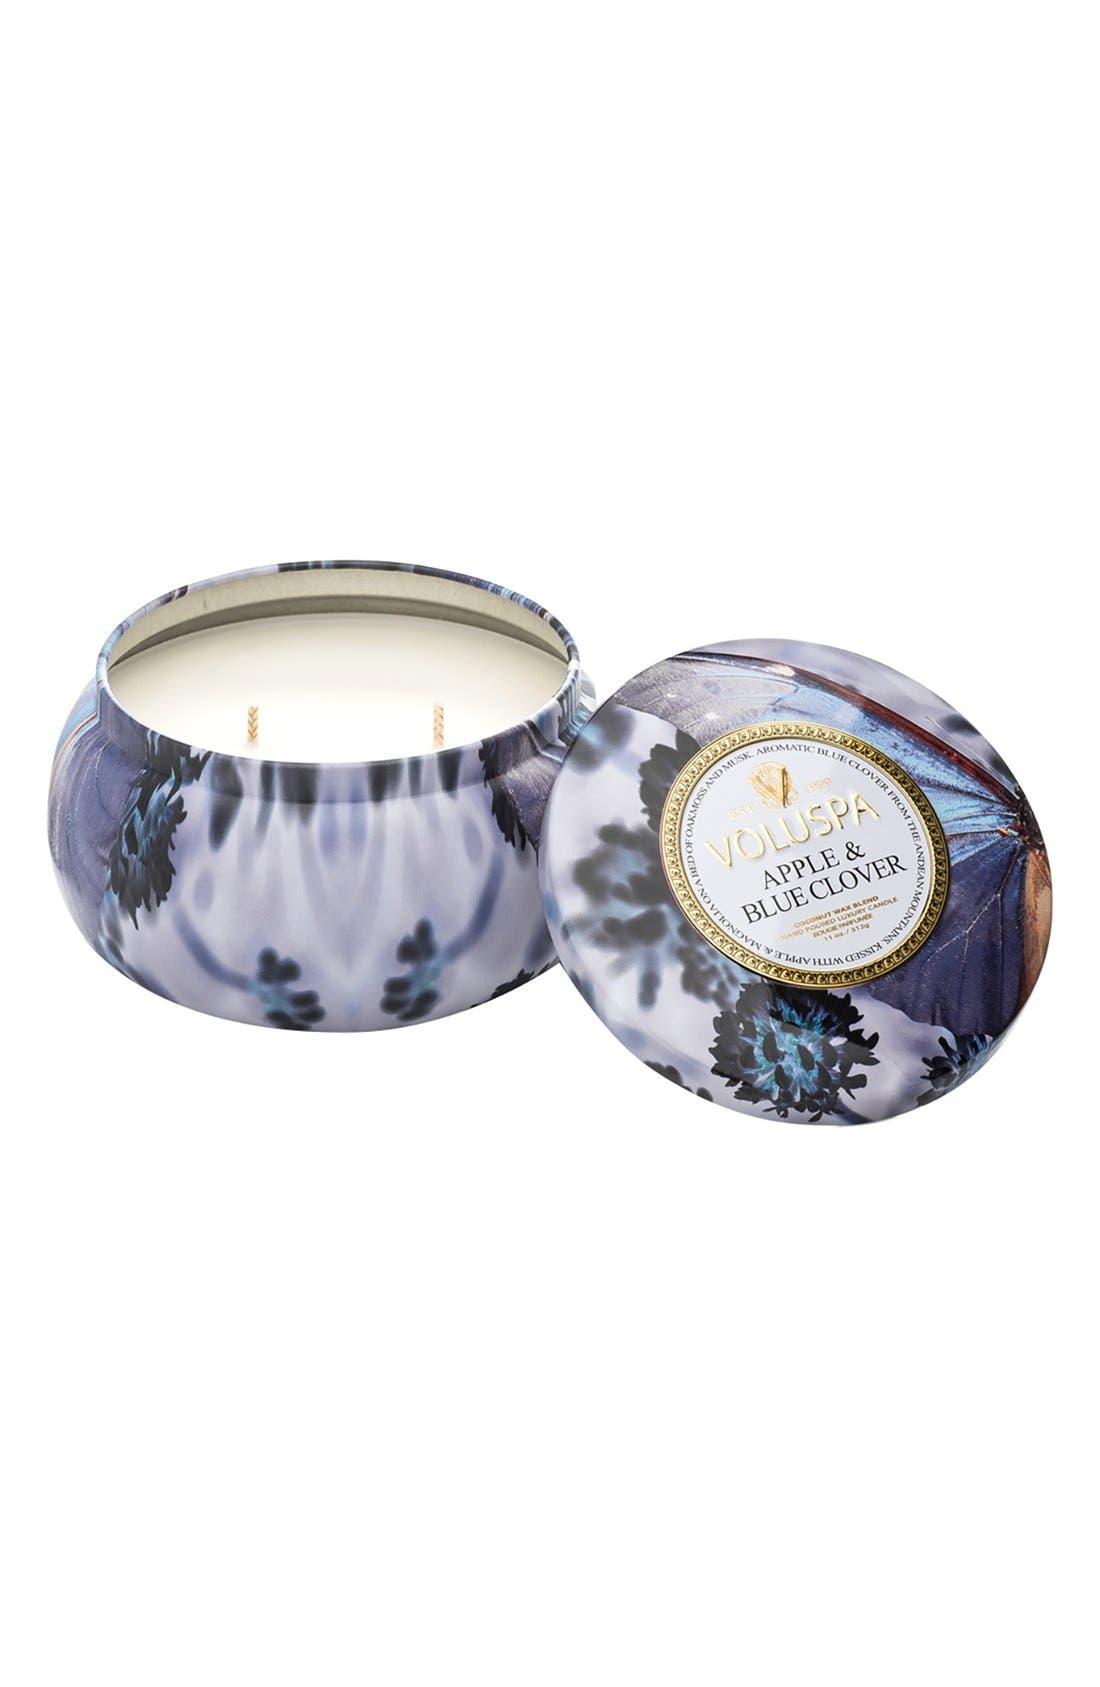 Maison Jardin Apple & Blue Clover Maison Metallo 2-Wick Candle,                             Main thumbnail 1, color,                             APPLE BLUE CLOVER